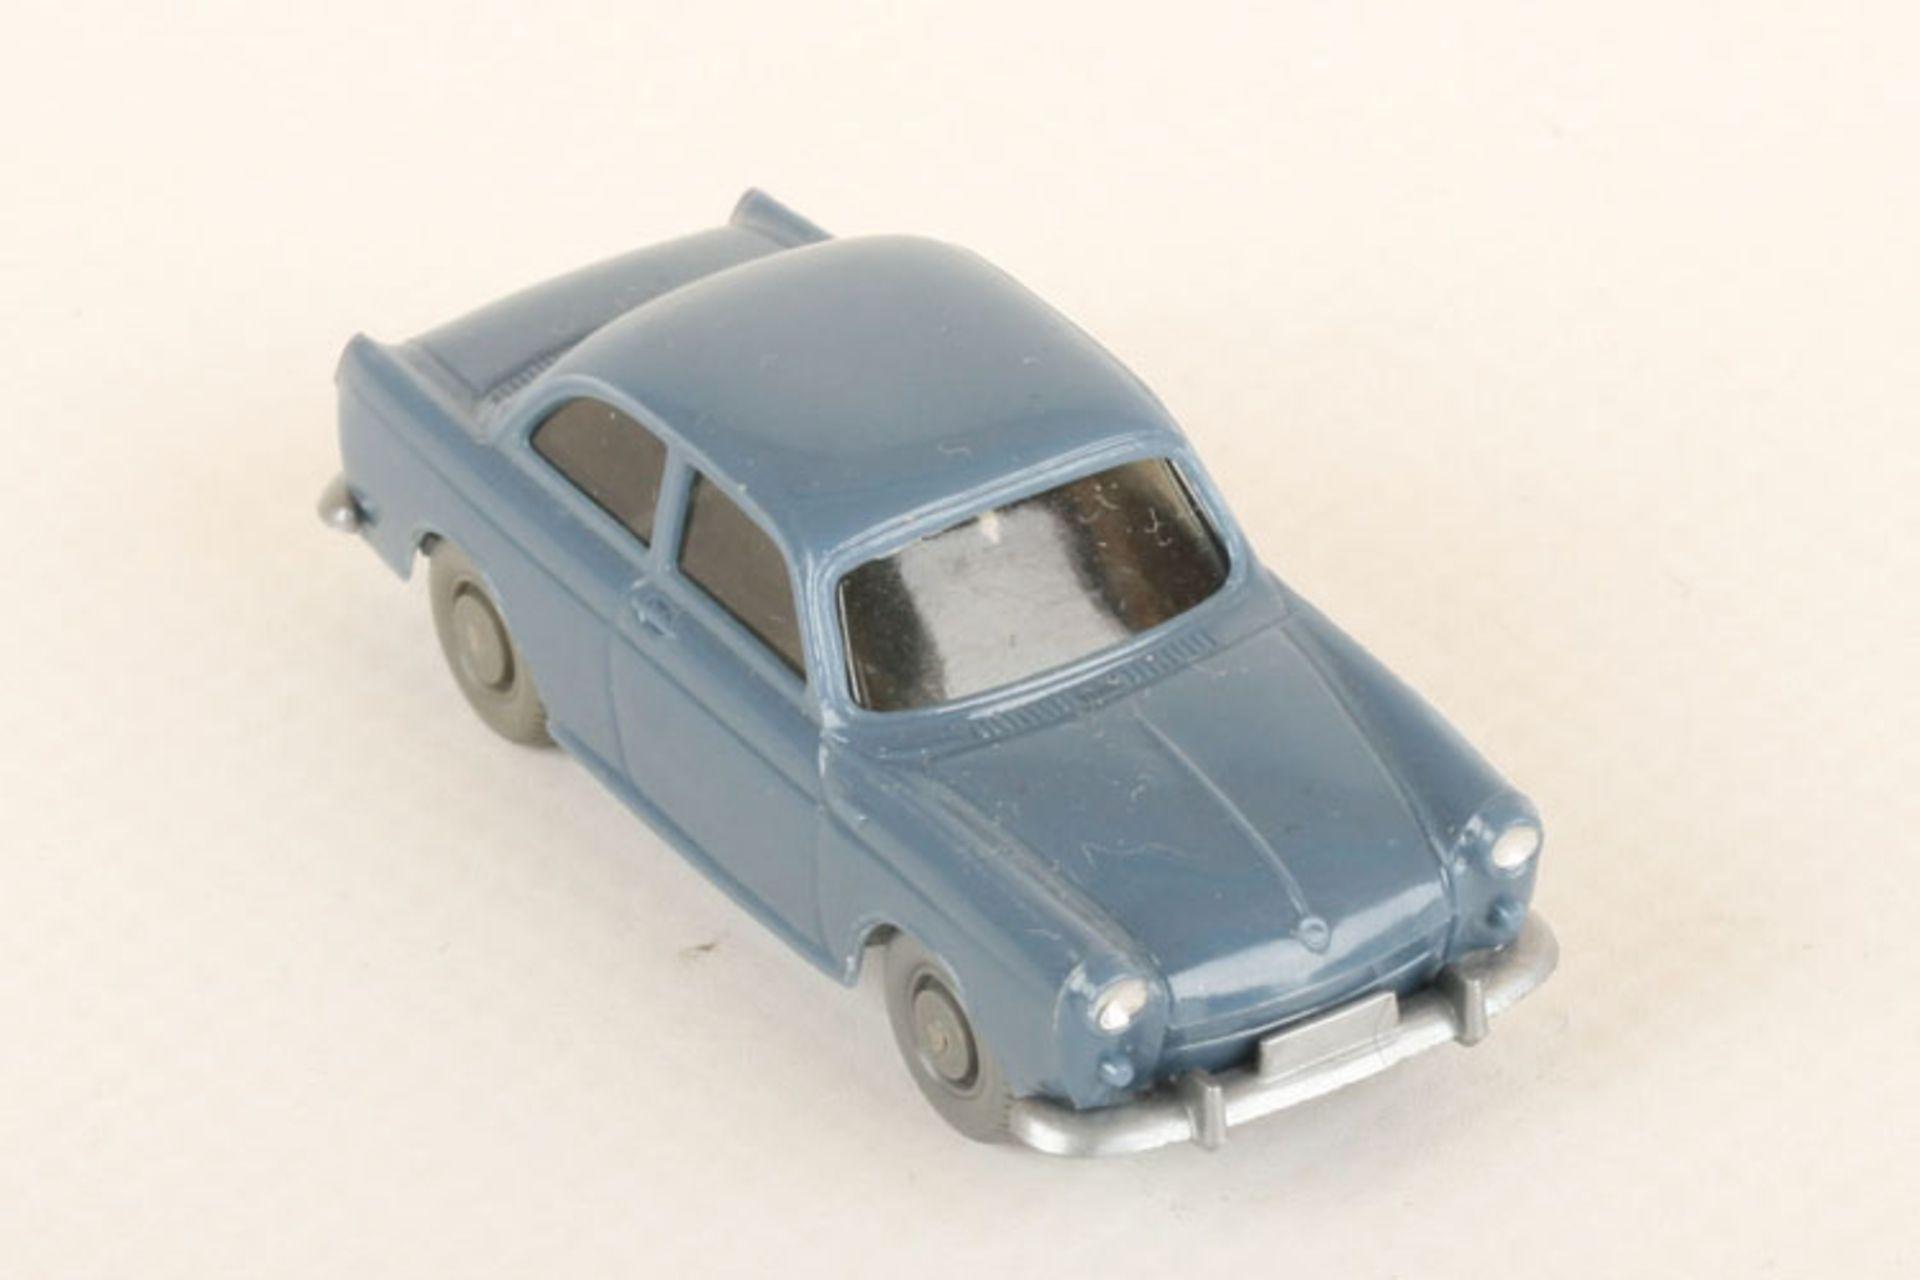 Los 1036 - Wiking VW 1500 taubenblau 40/12e, neuwertig